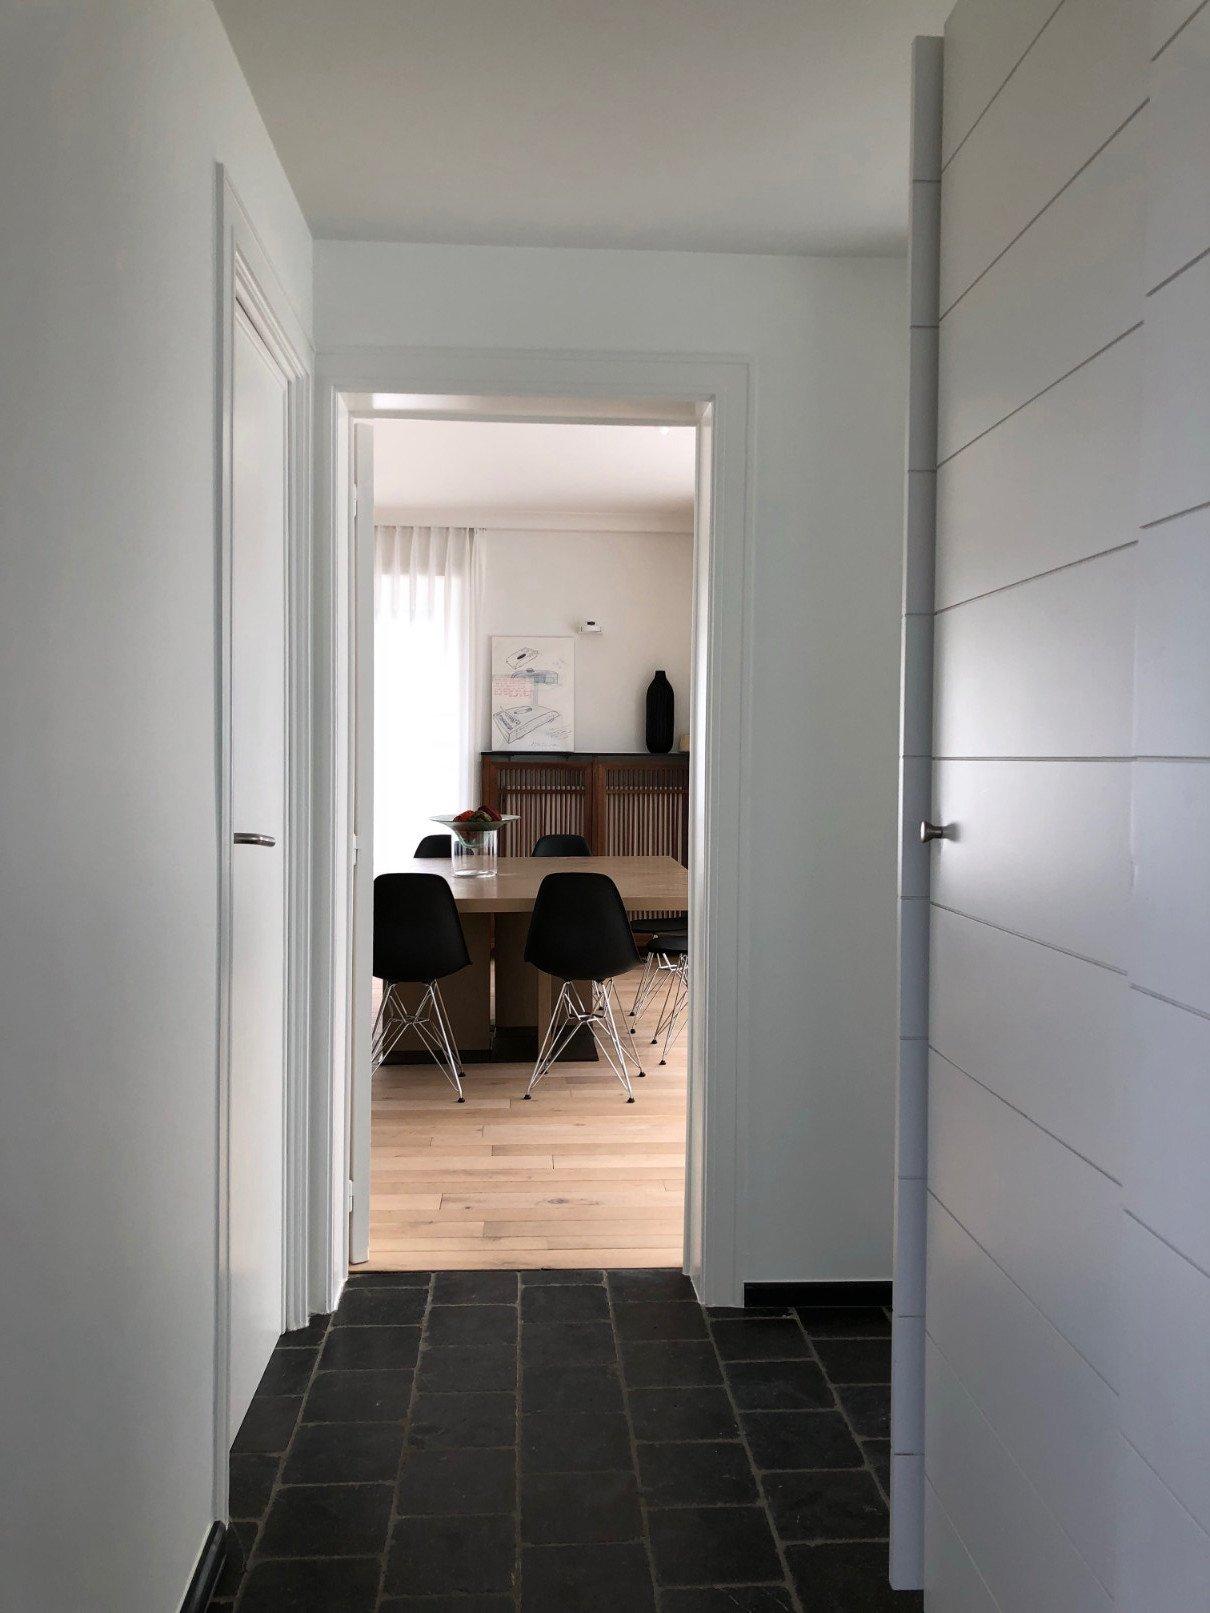 Rietveldprojects-Villa Were Di - Te Koop : Te Huur (per week)28.jpg